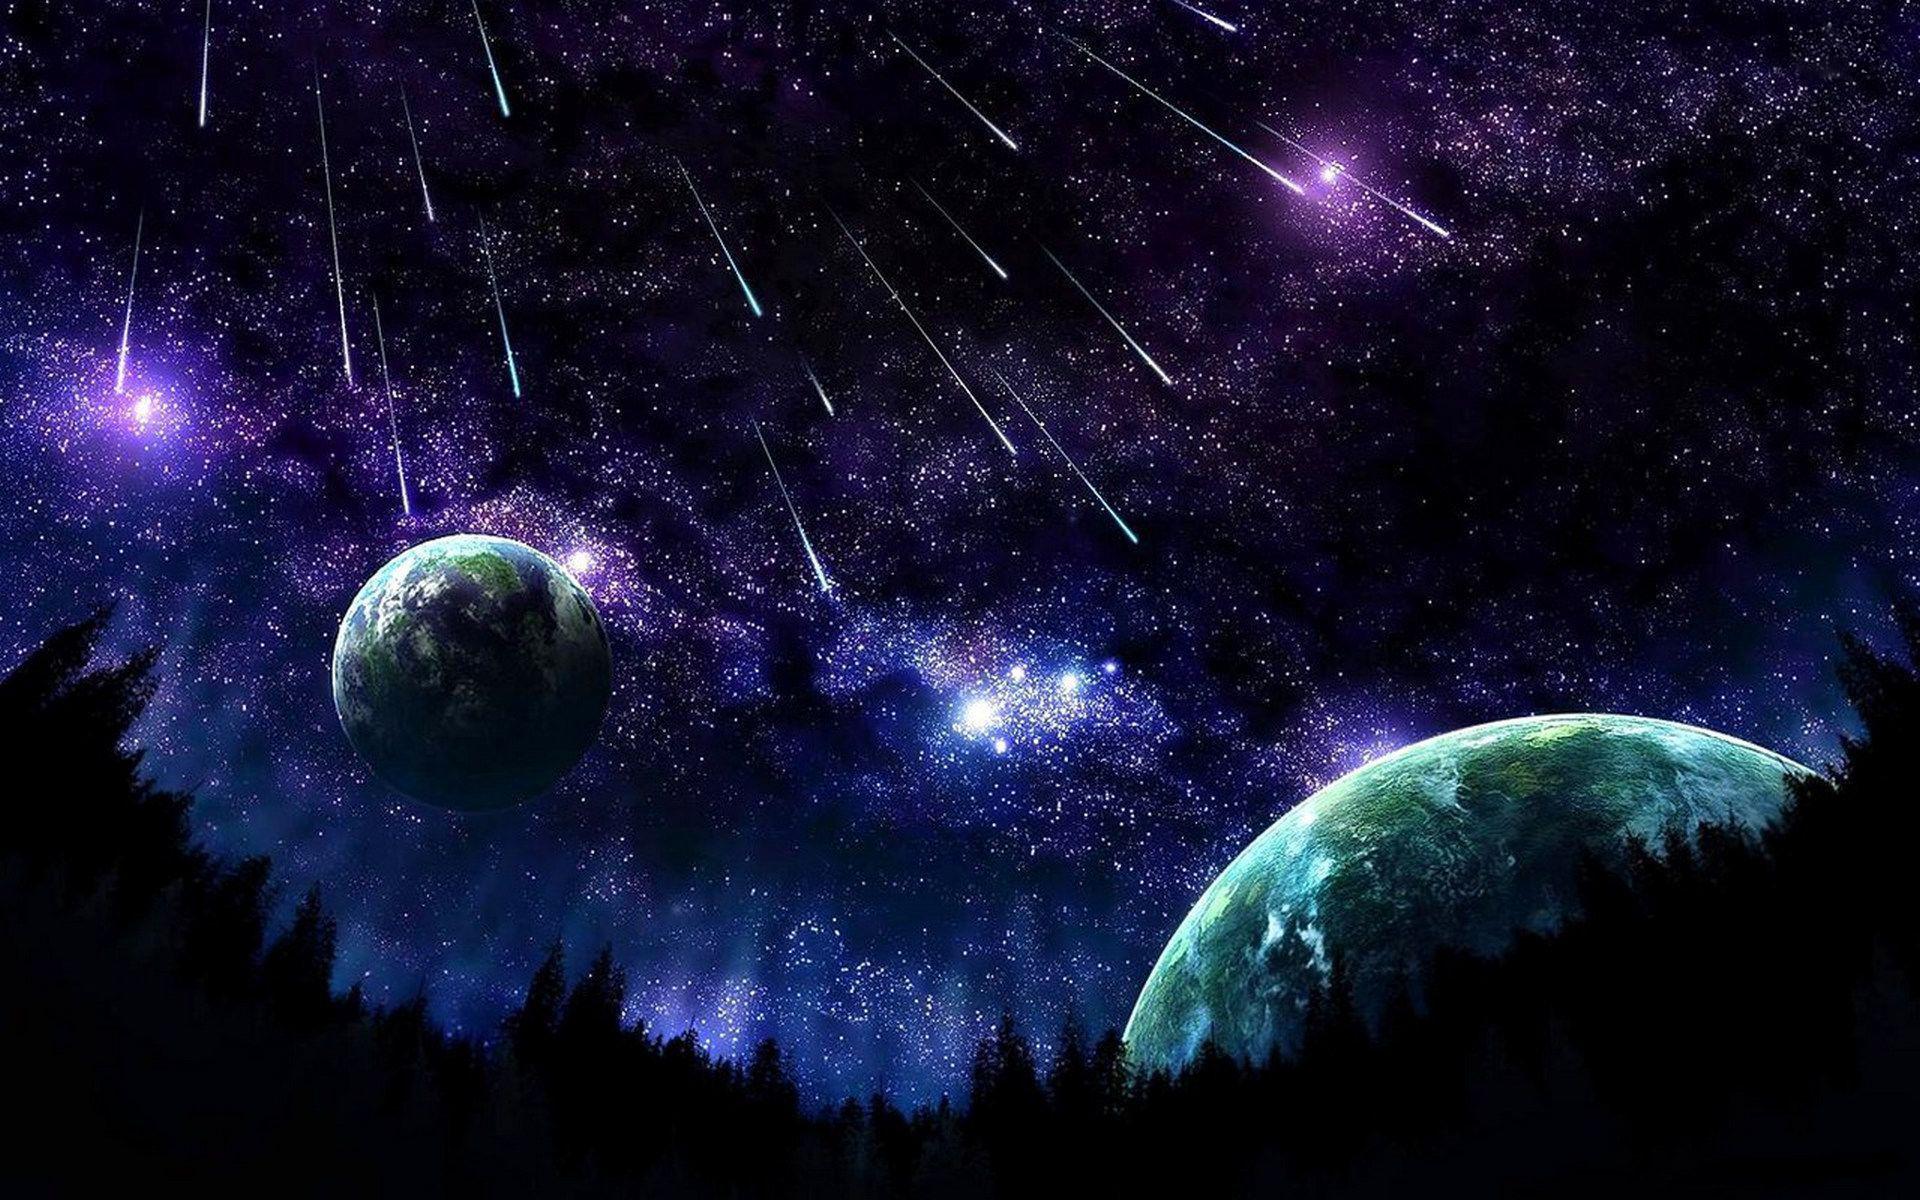 Desktop Night Sky HD Wallpapers 1920x1200